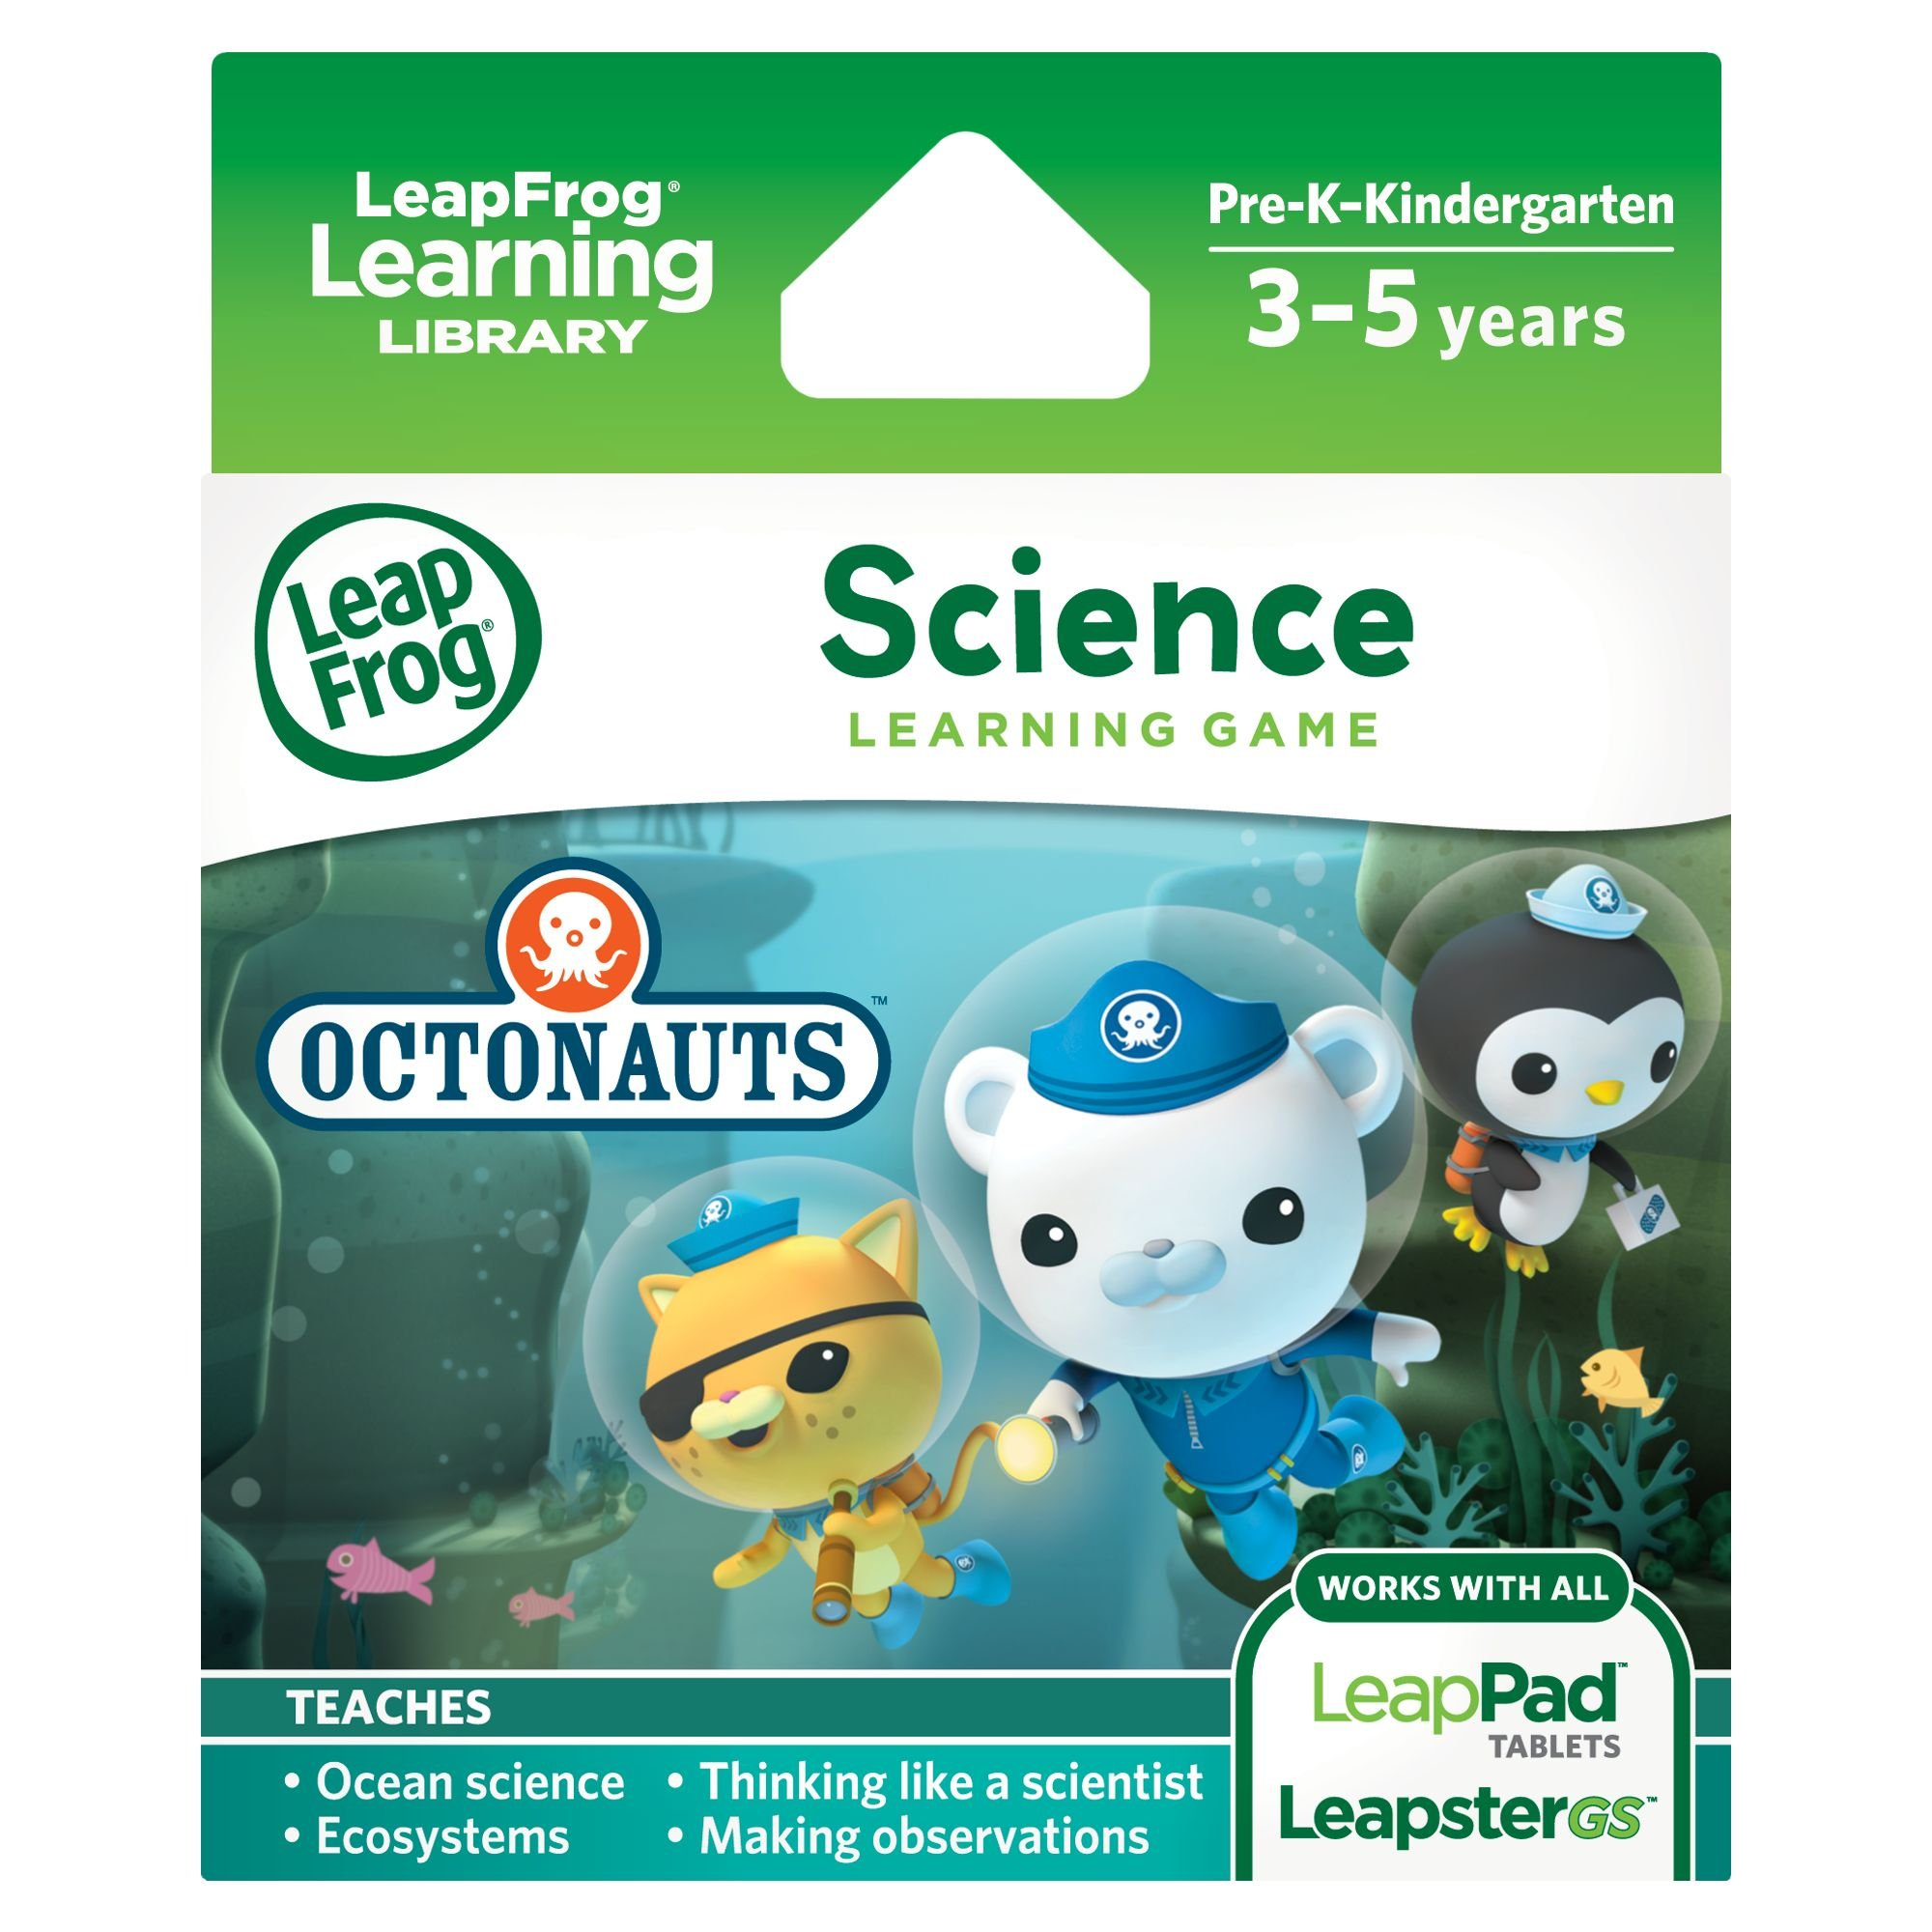 LeapFrog Science Learning Game Disney Octonauts for LeapPad Platinum, LeapPad Ultra, LeapPad1, LeapPad2, LeapPad3, Leapster Explorer, LeapsterGS Explorer by LeapFrog (Image #1)